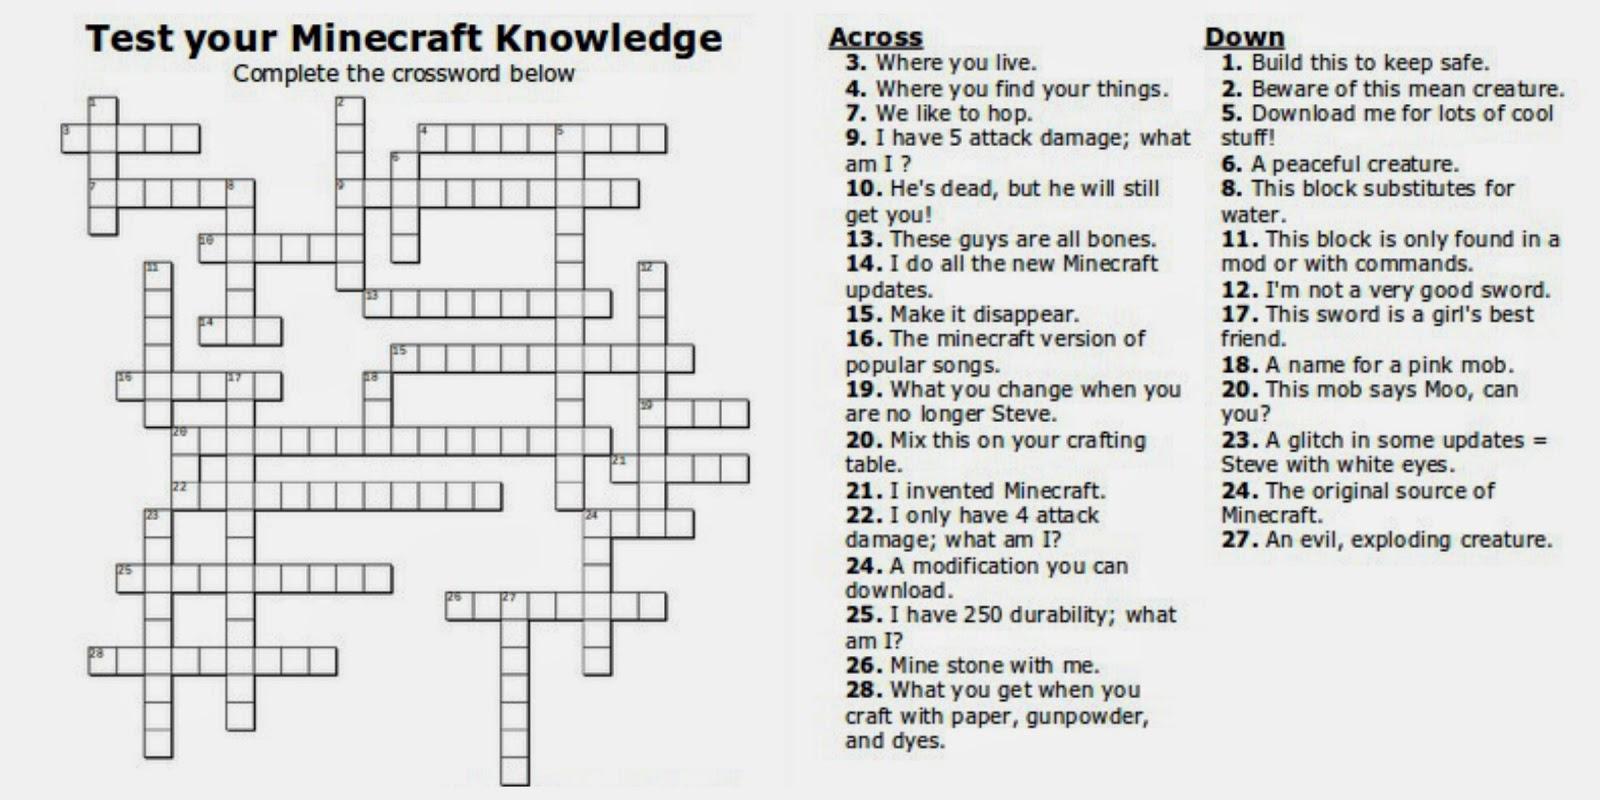 Free Printable Minecraft Crossword Search: Test Your Minecraft - Printable Quiz Crossword